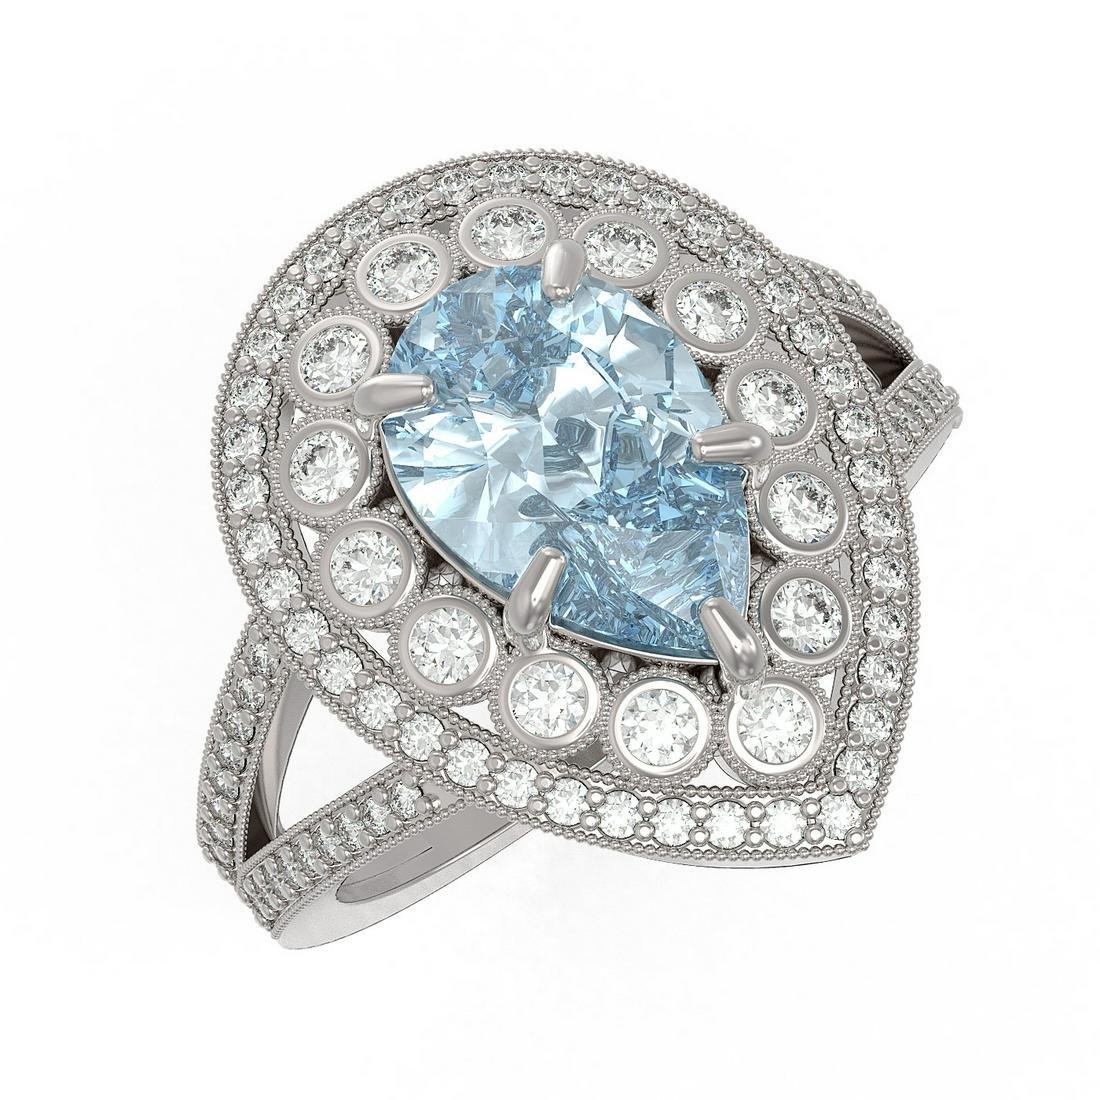 3.82 ctw Certified Aquamarine & Diamond Victorian Ring